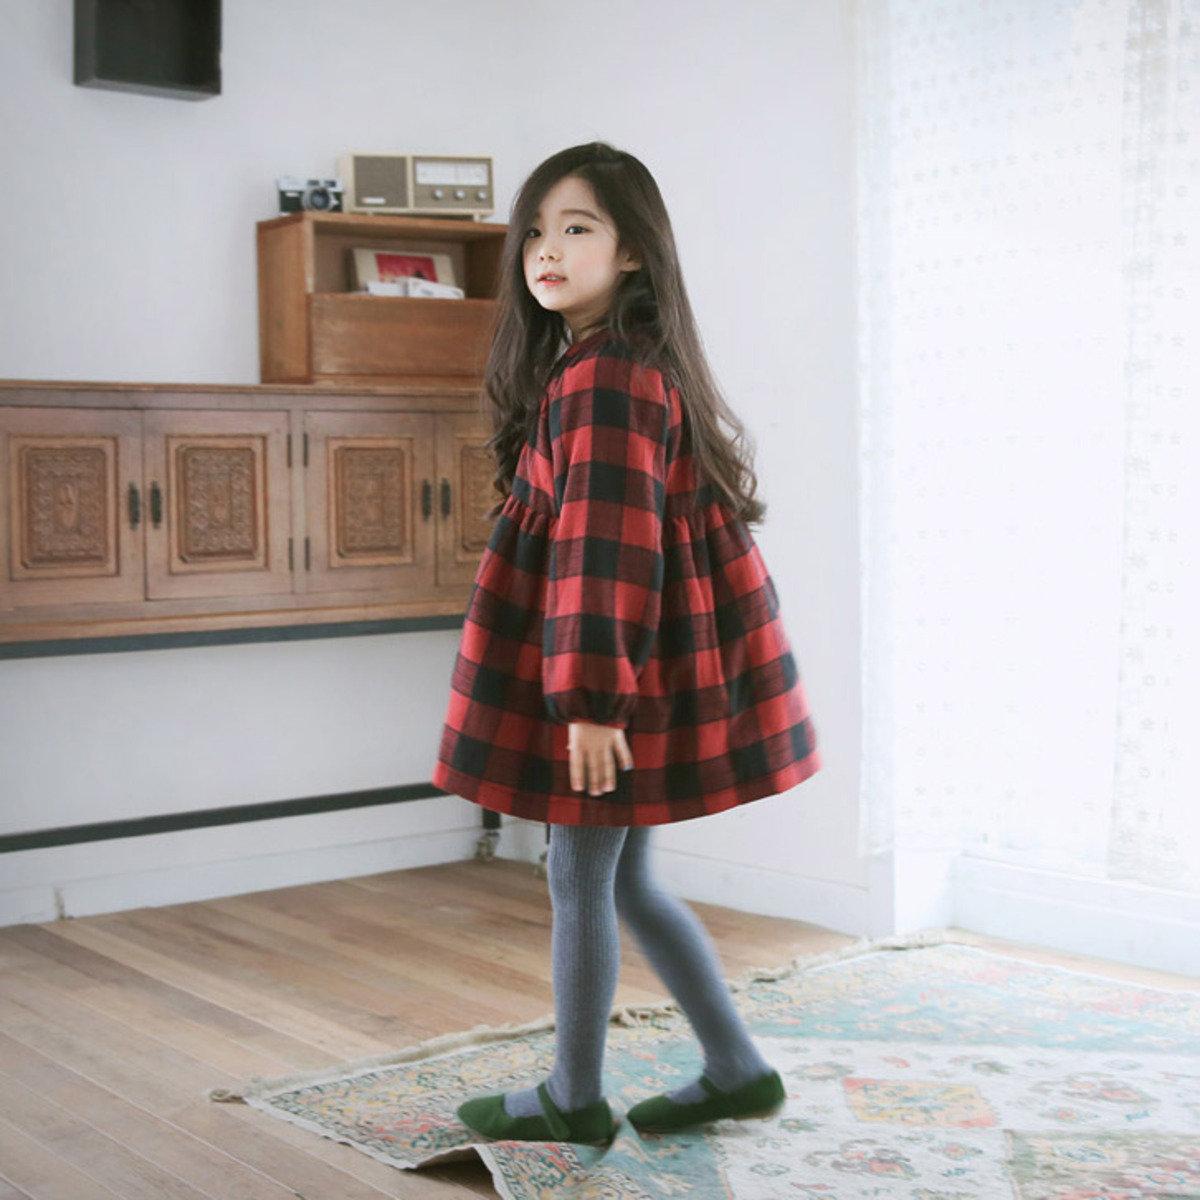 [15 W] 格仔圖案娃娃裙_S60133